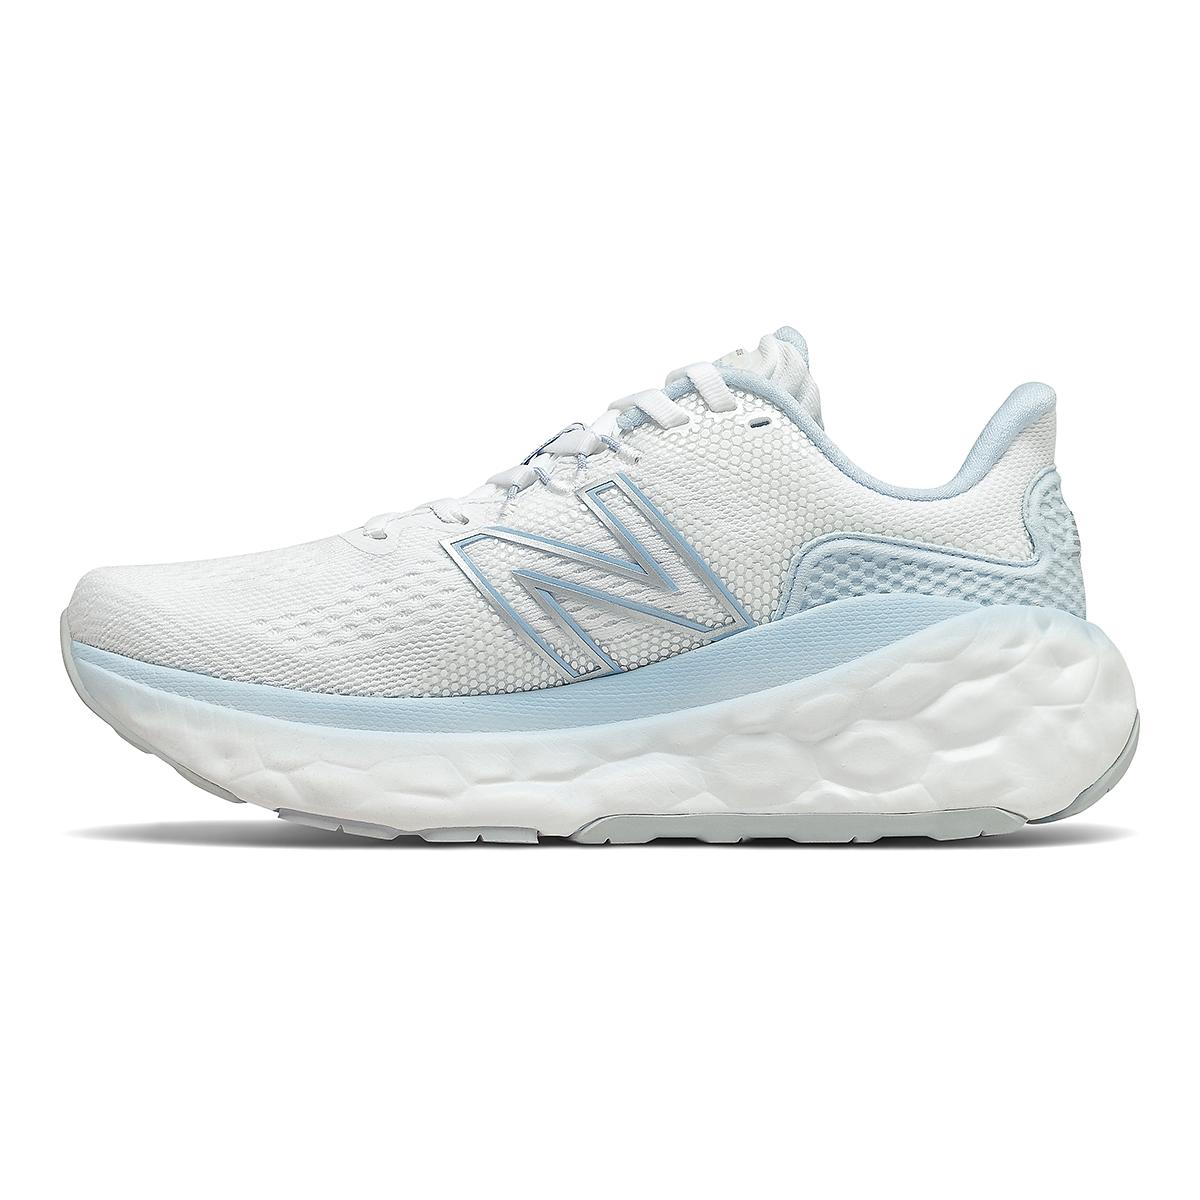 Women's New Balance More V3 Running Shoe - Color: White/Uv Glo - Size: 5 - Width: Extra Wide, White/Uv Glo, large, image 2